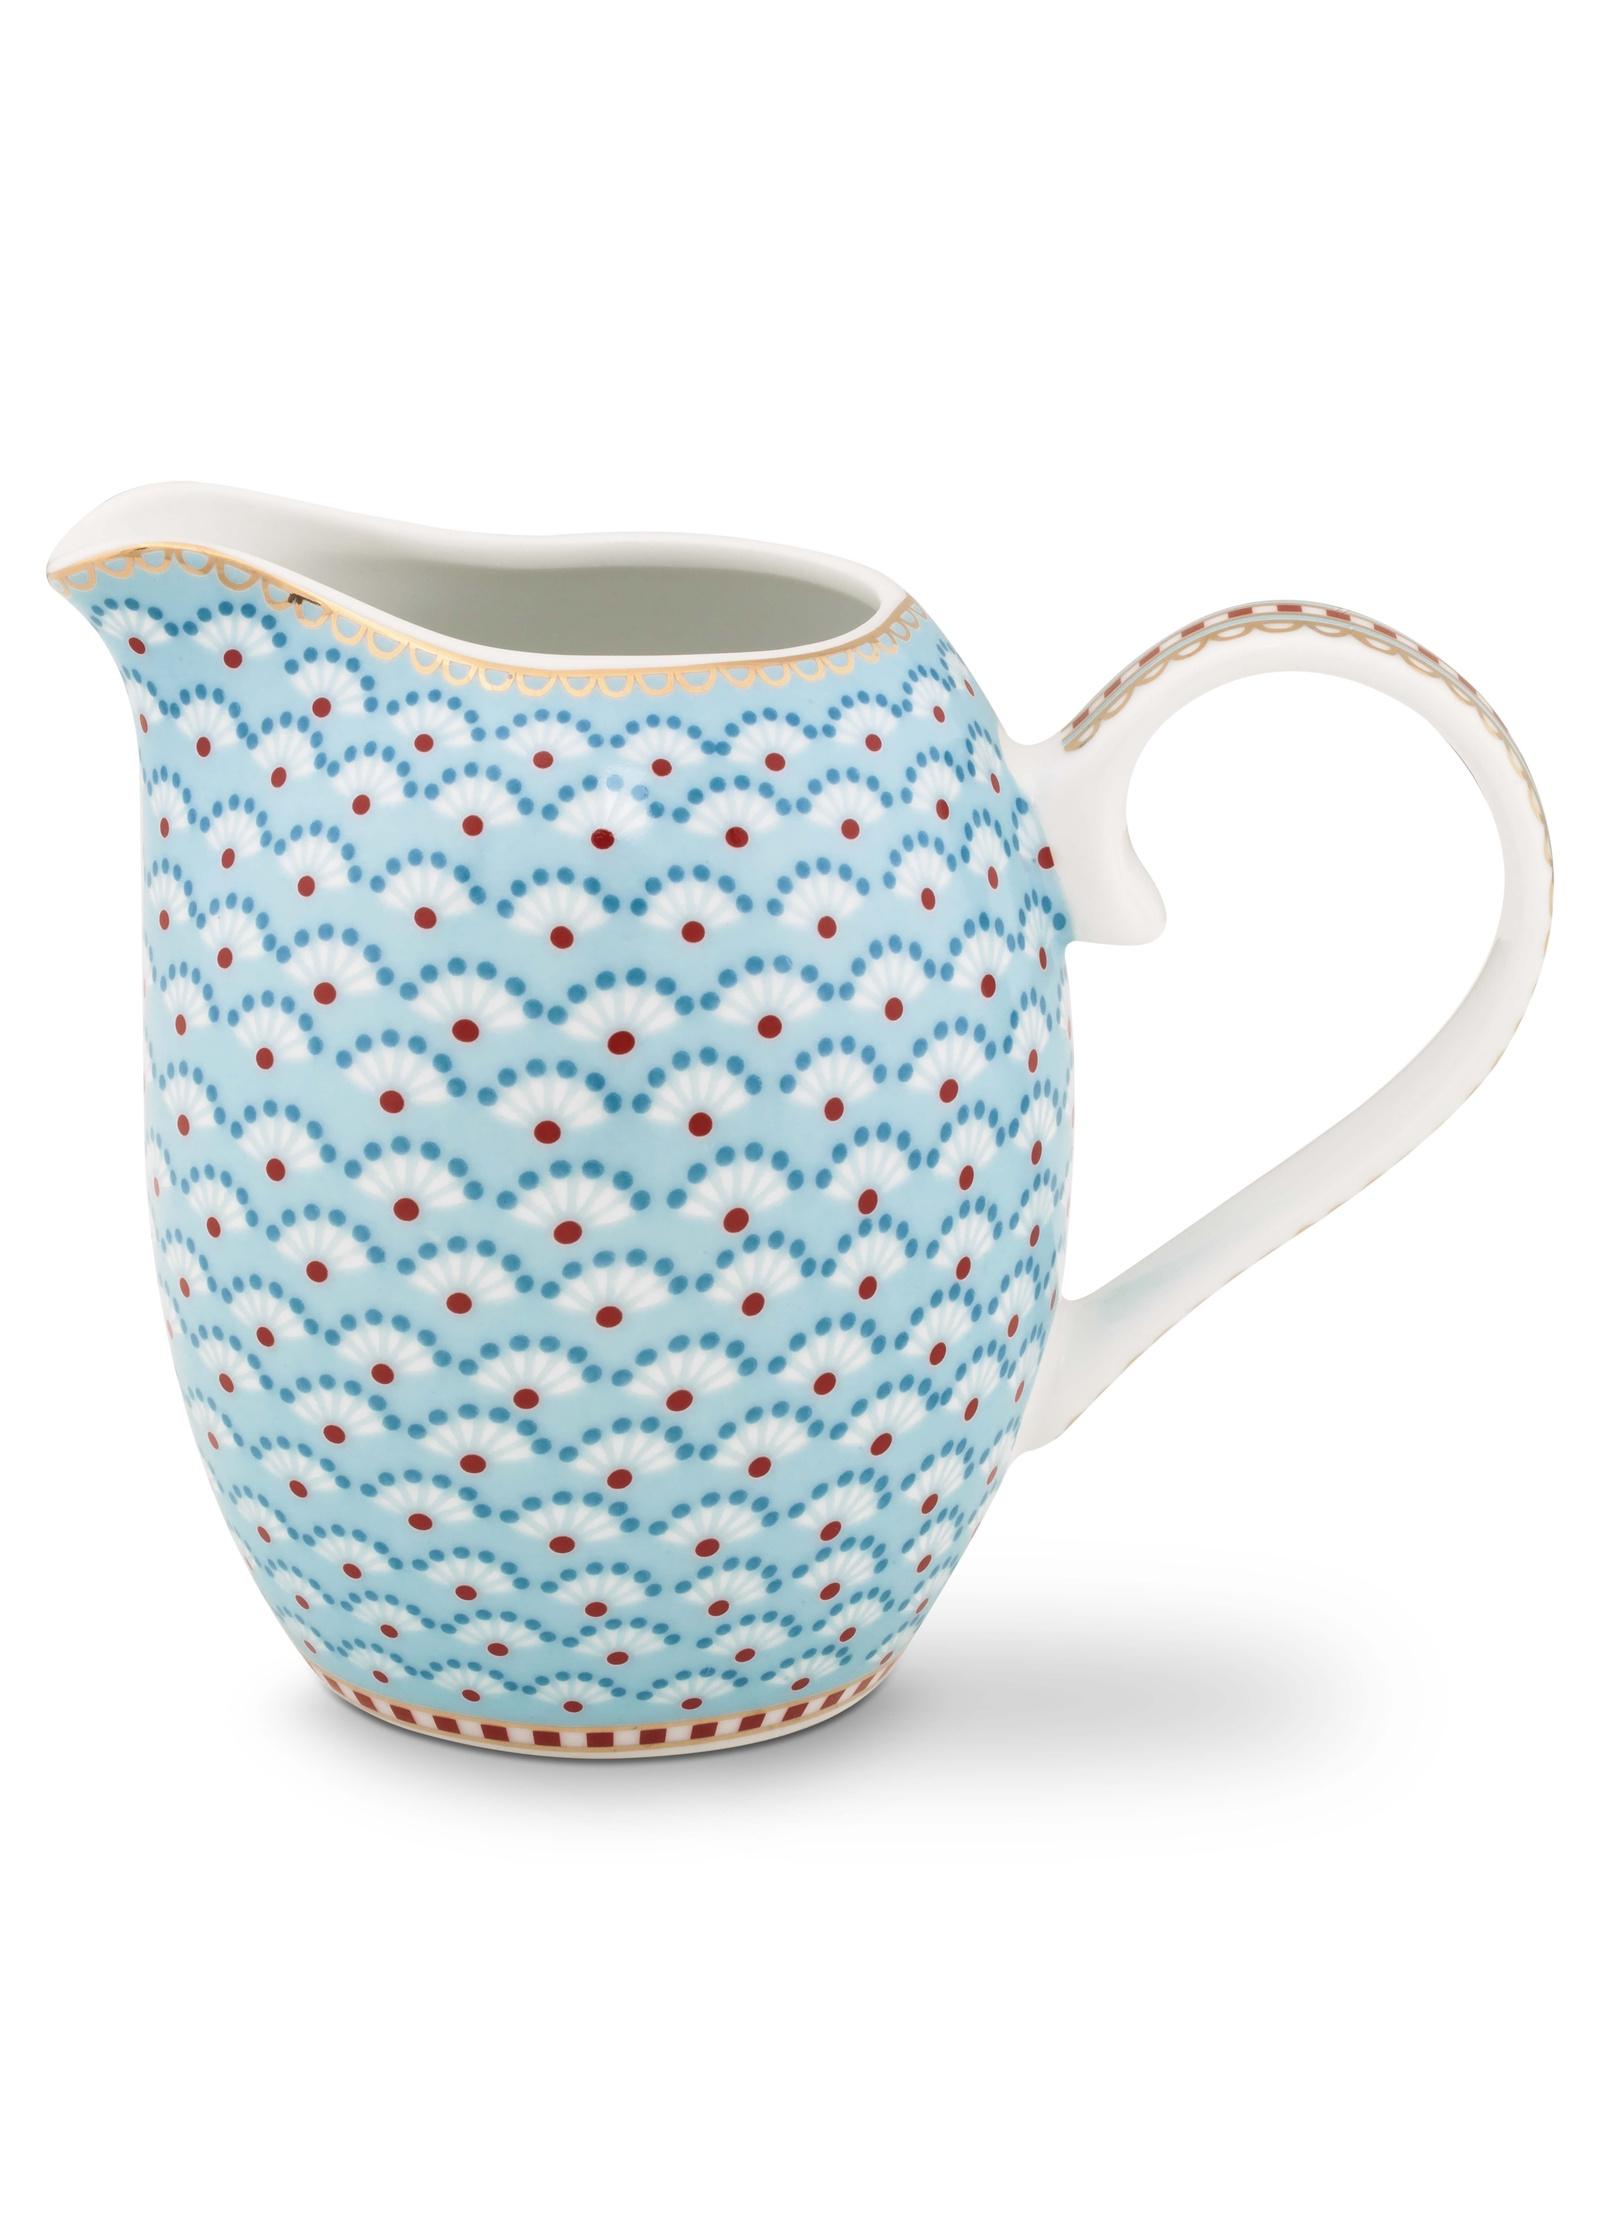 Молочник Pip Studio Floral, цвет: голубой. 51.007.030